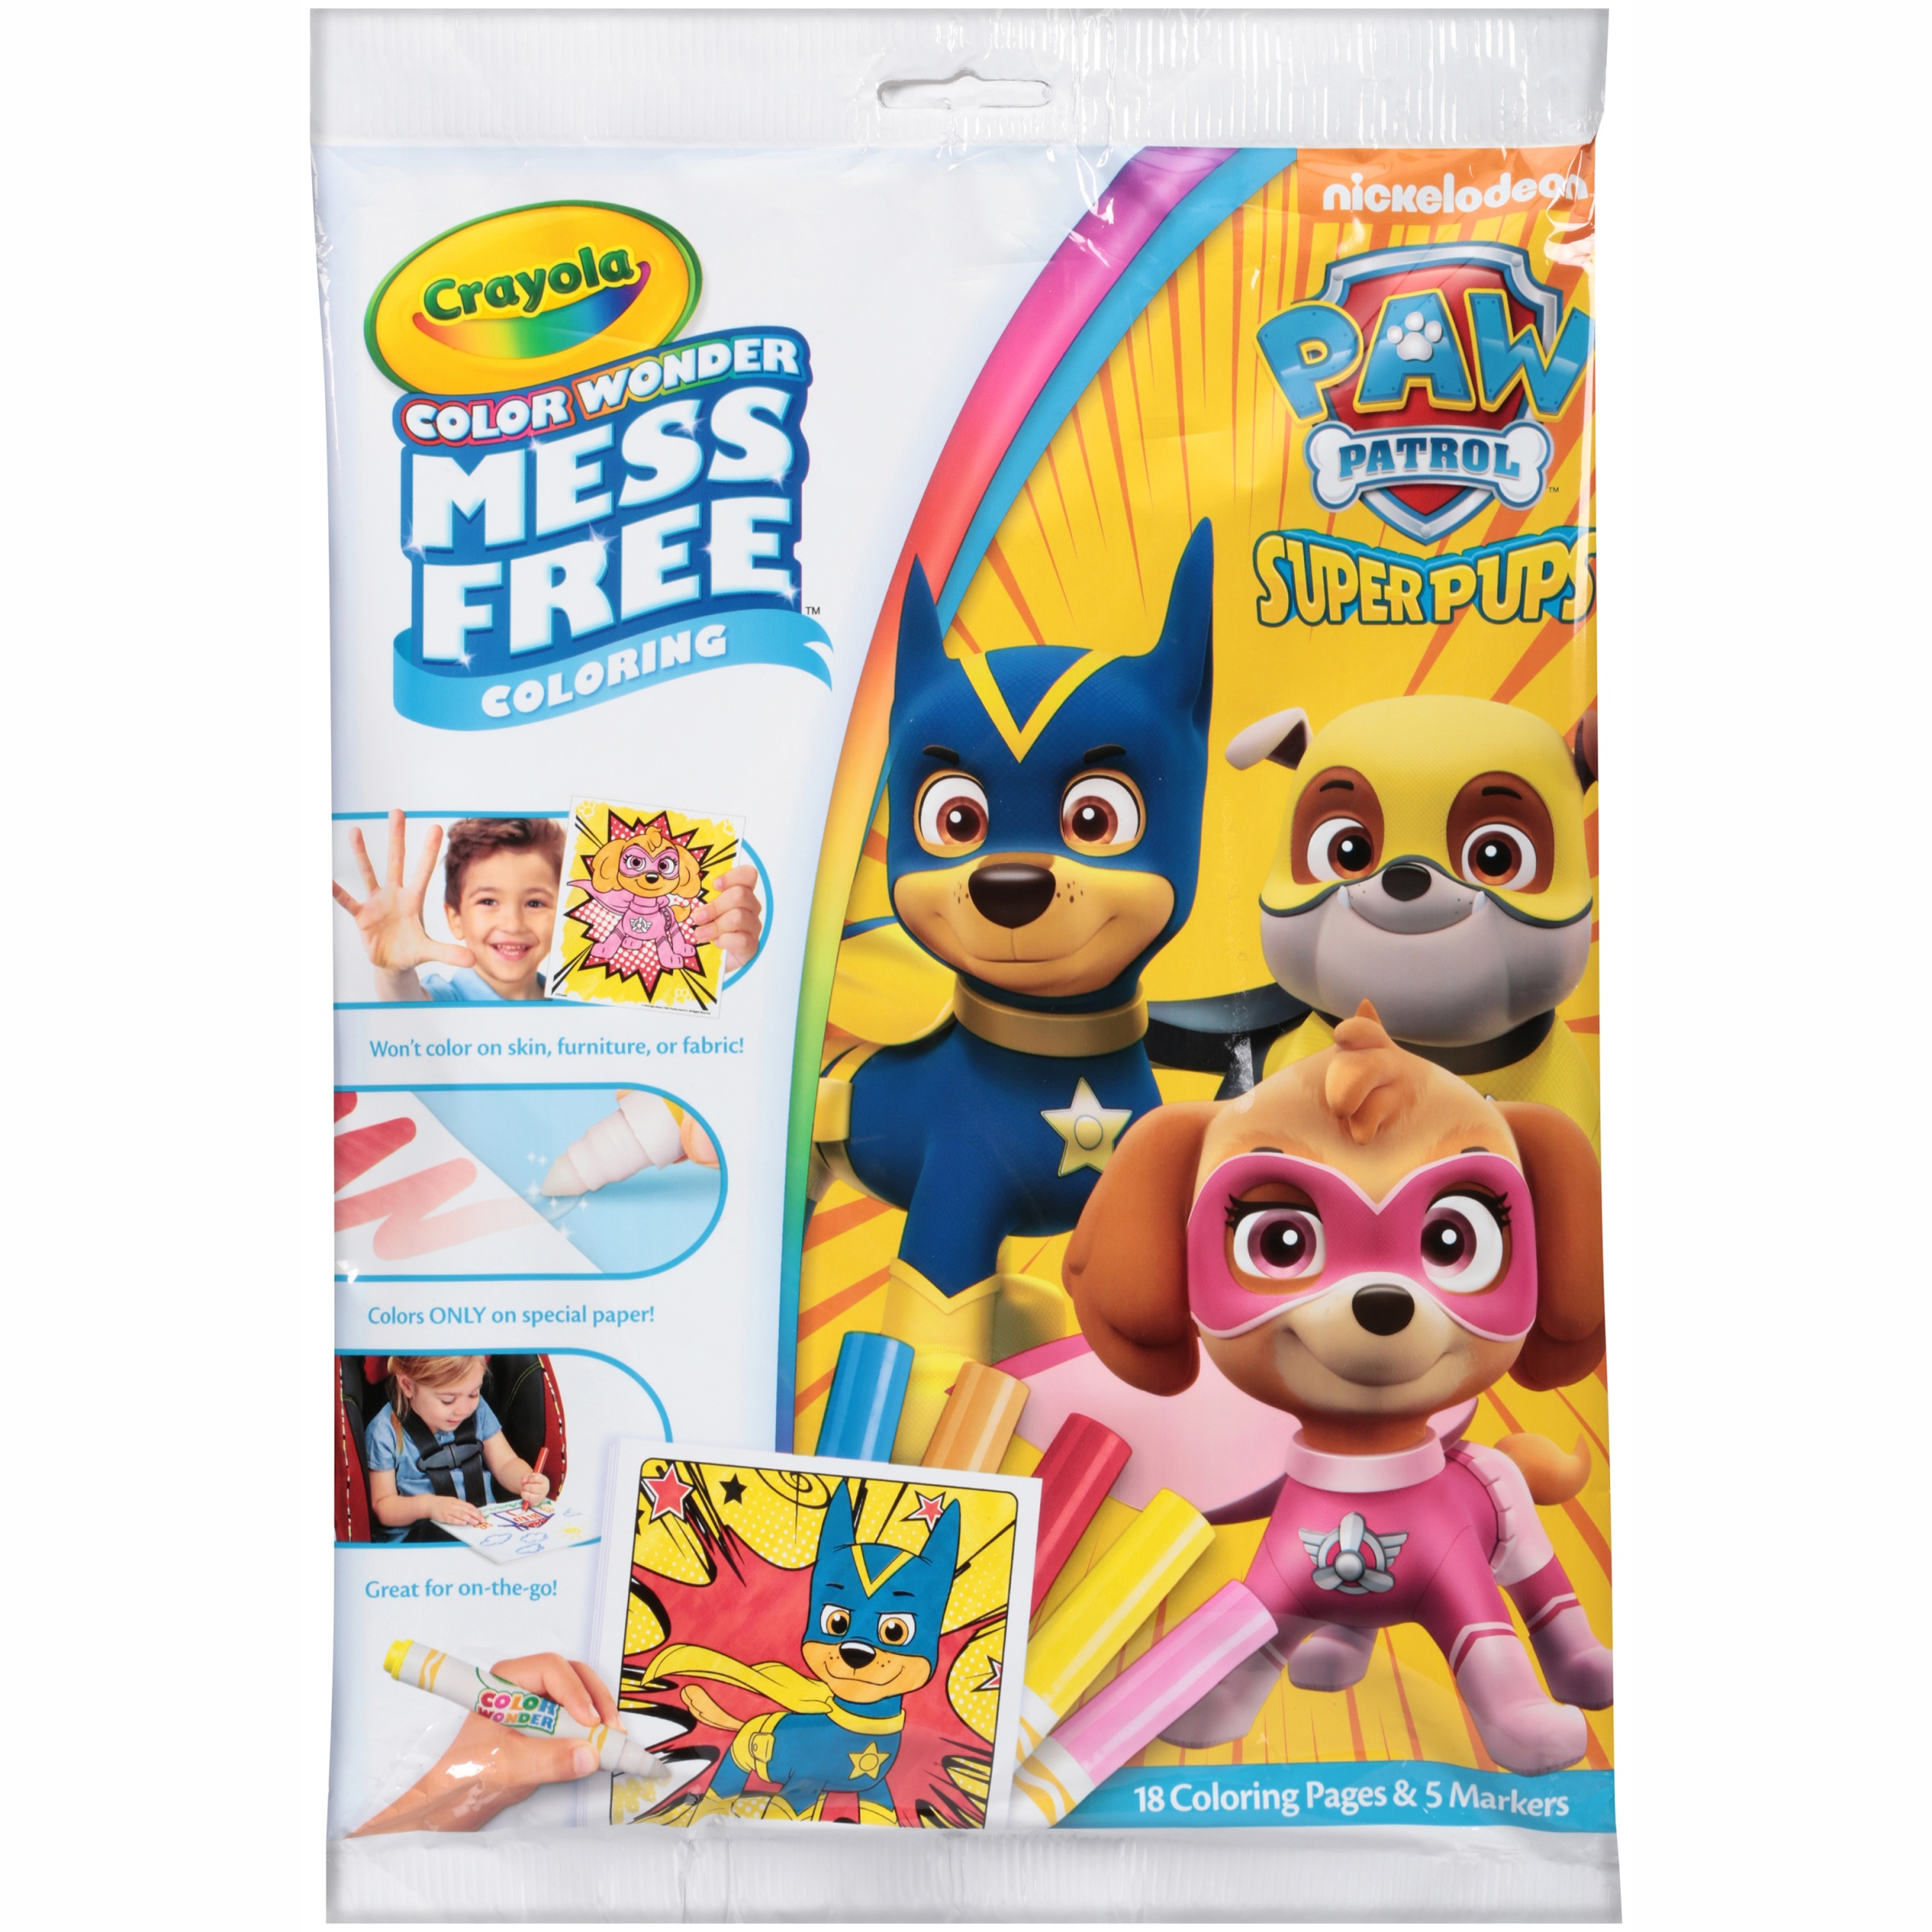 Crayola Nickelodeon Paw Patrol Super Pups Color Wonder Mess Free